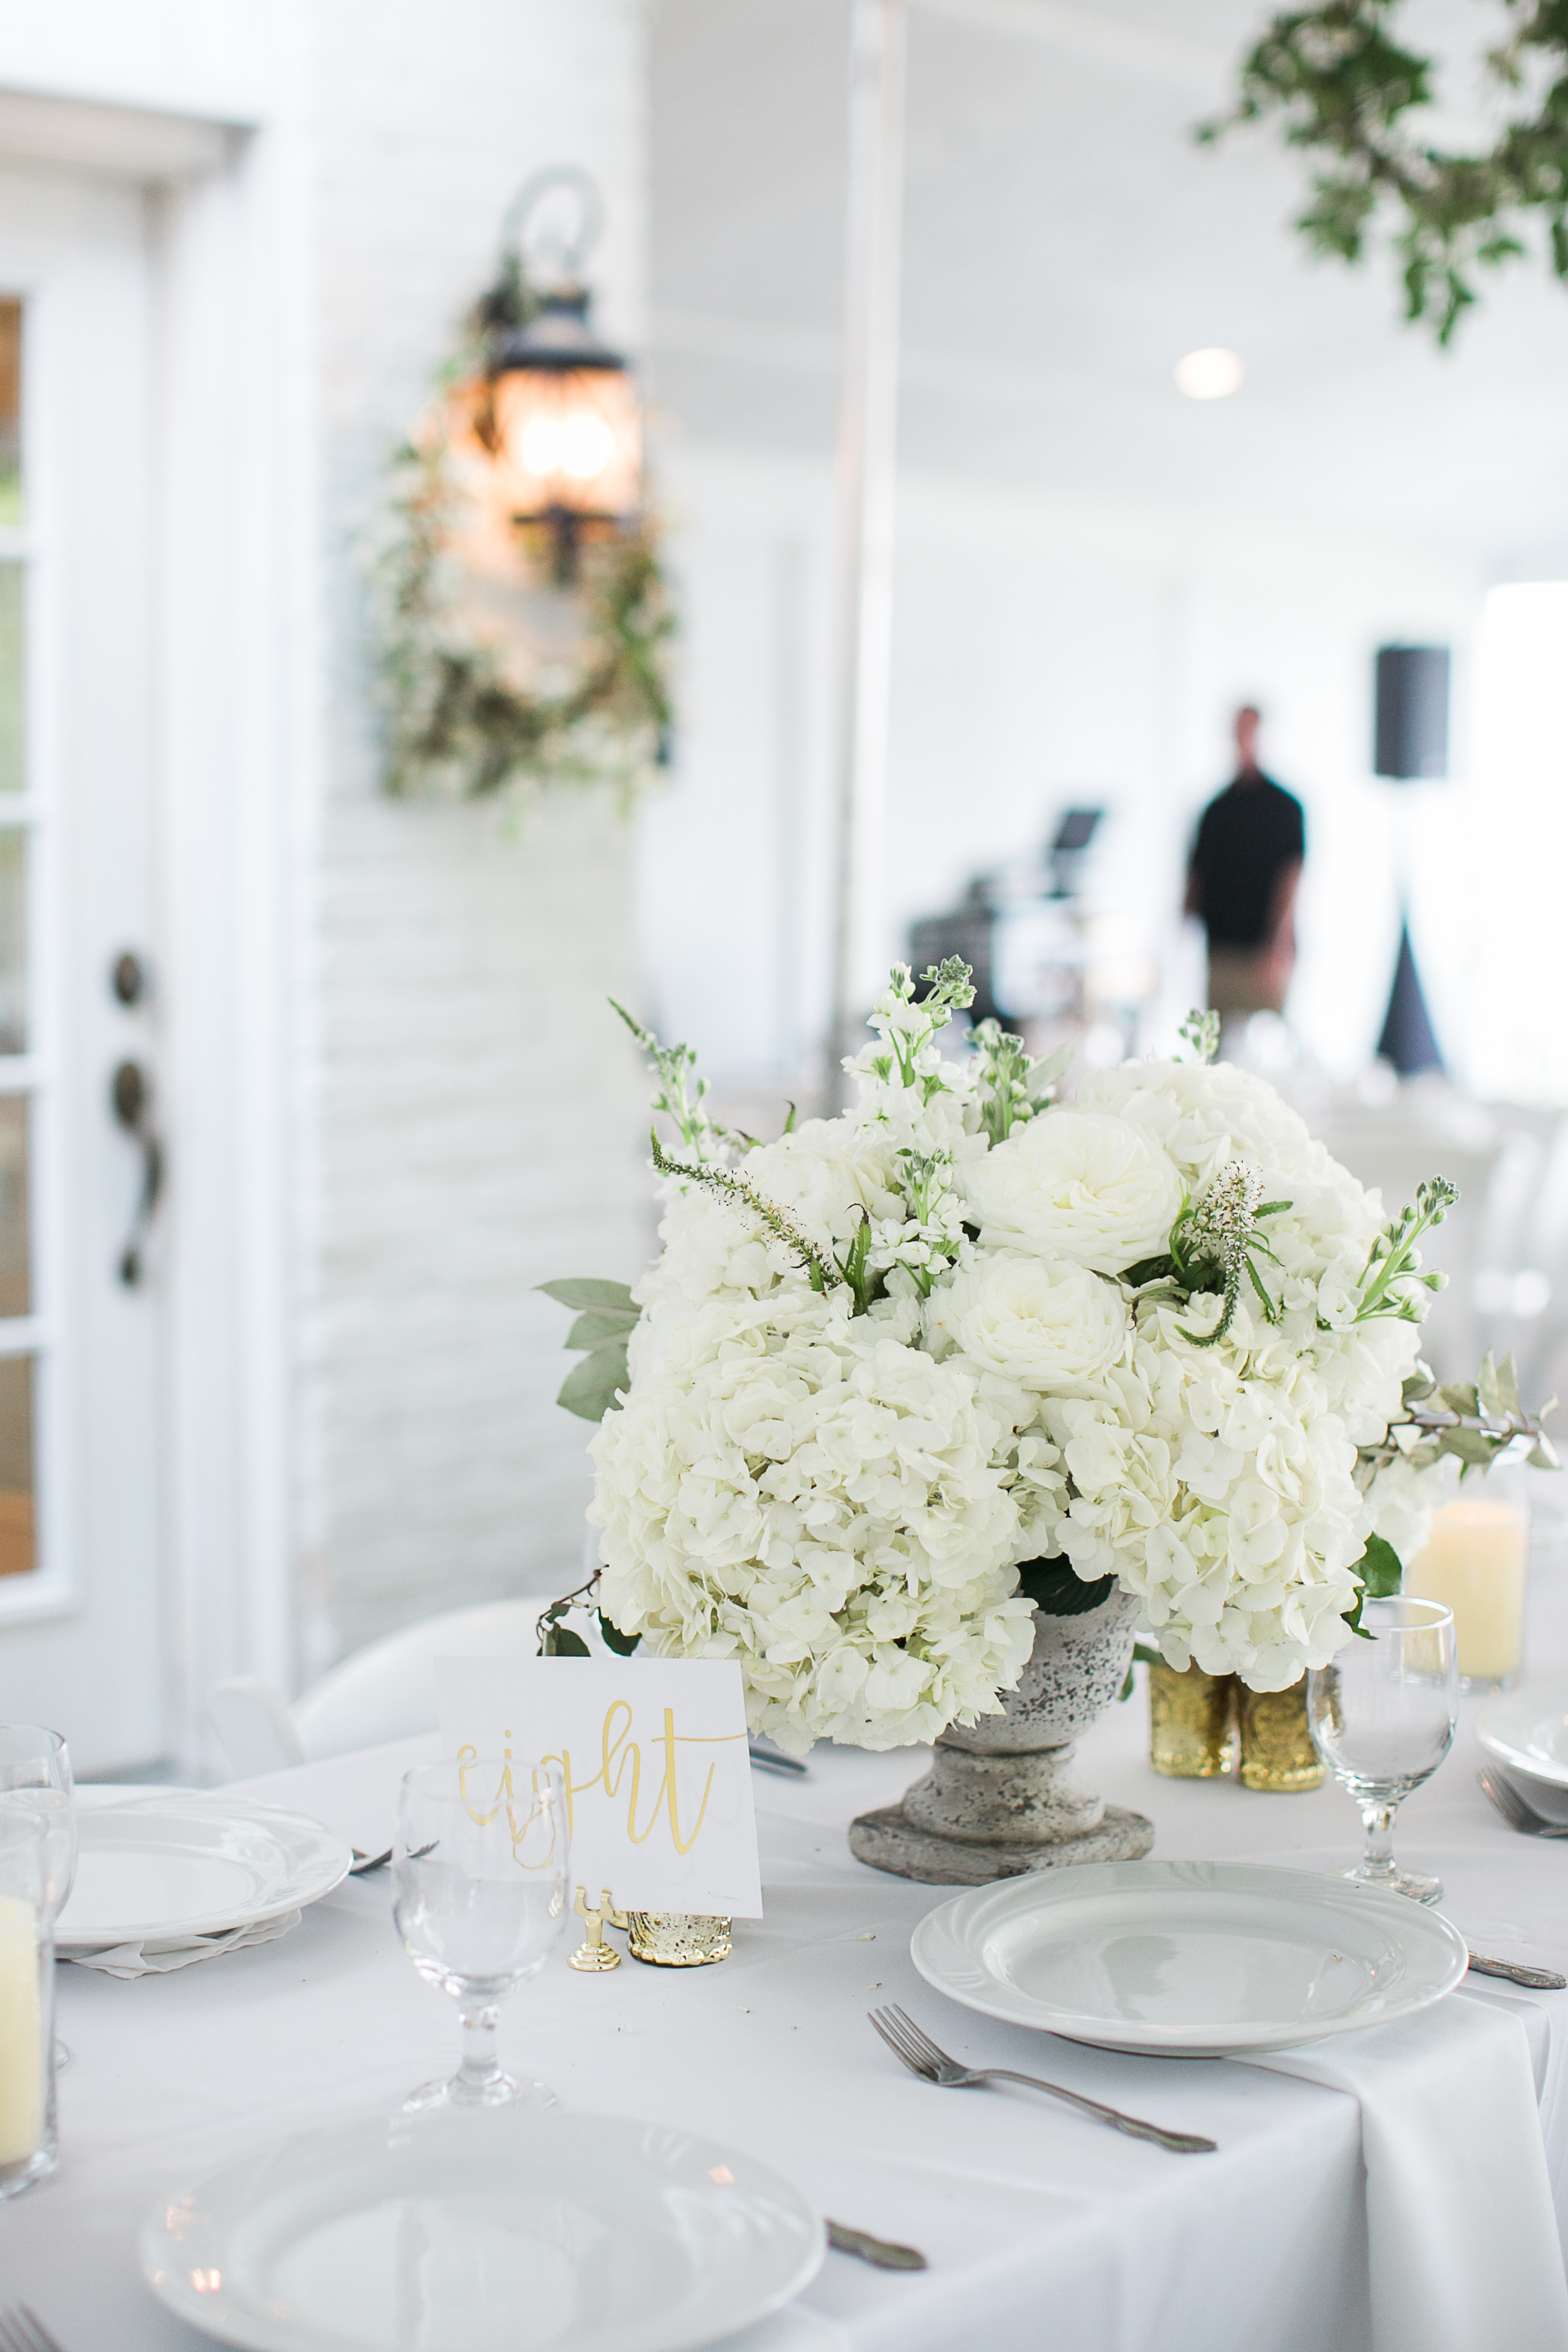 all white & greenery centerpiece